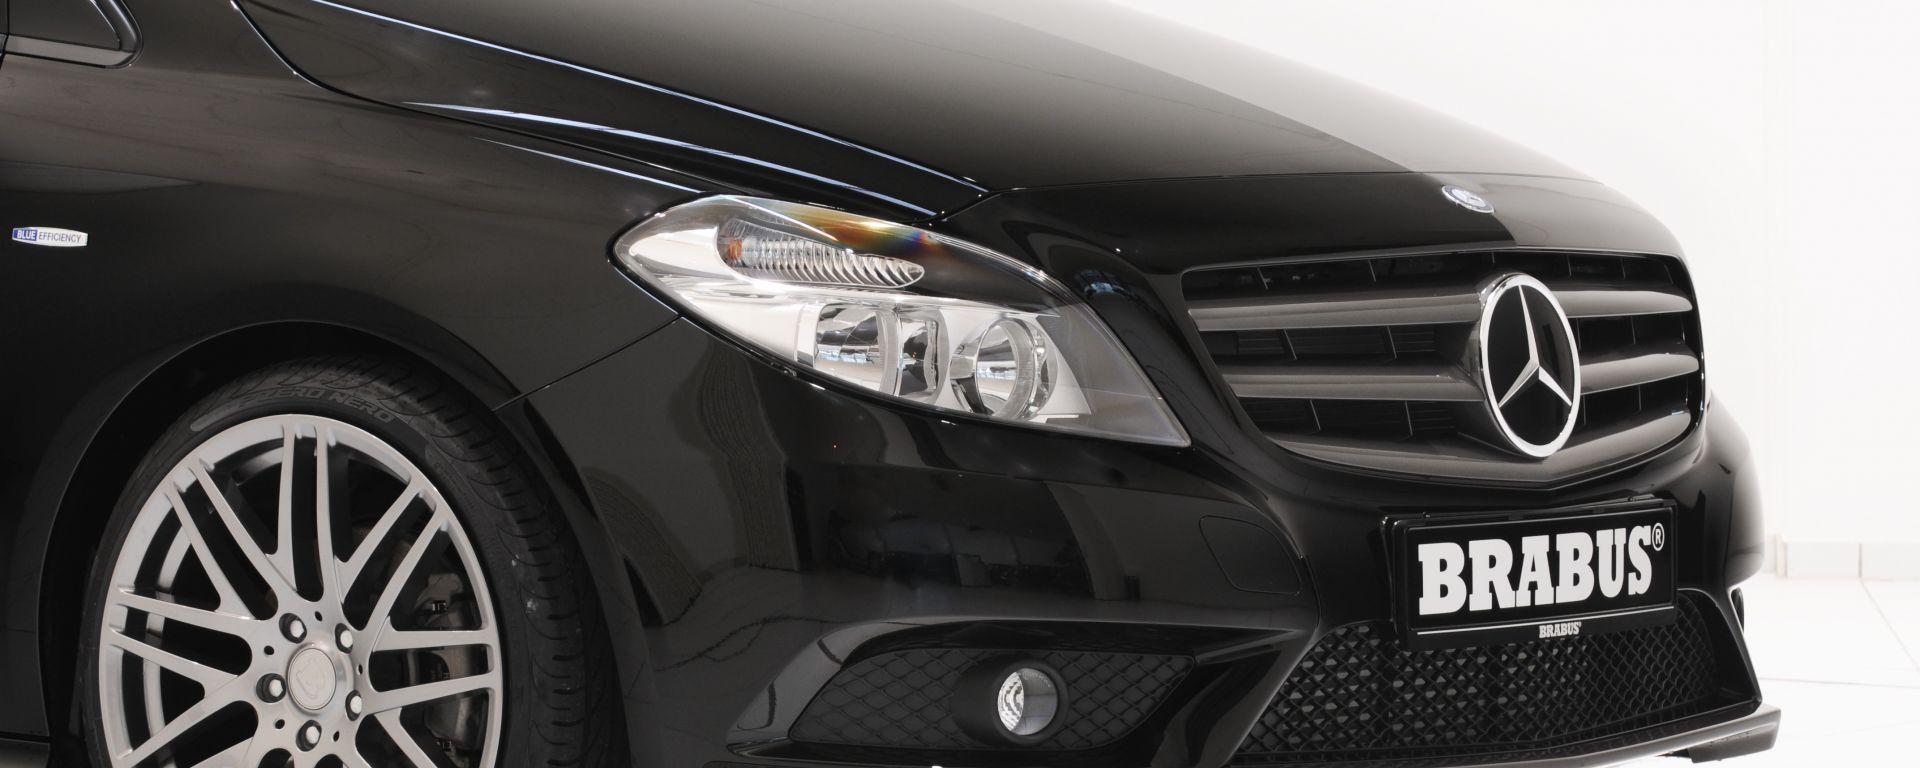 Mercedes Classe B Brabus